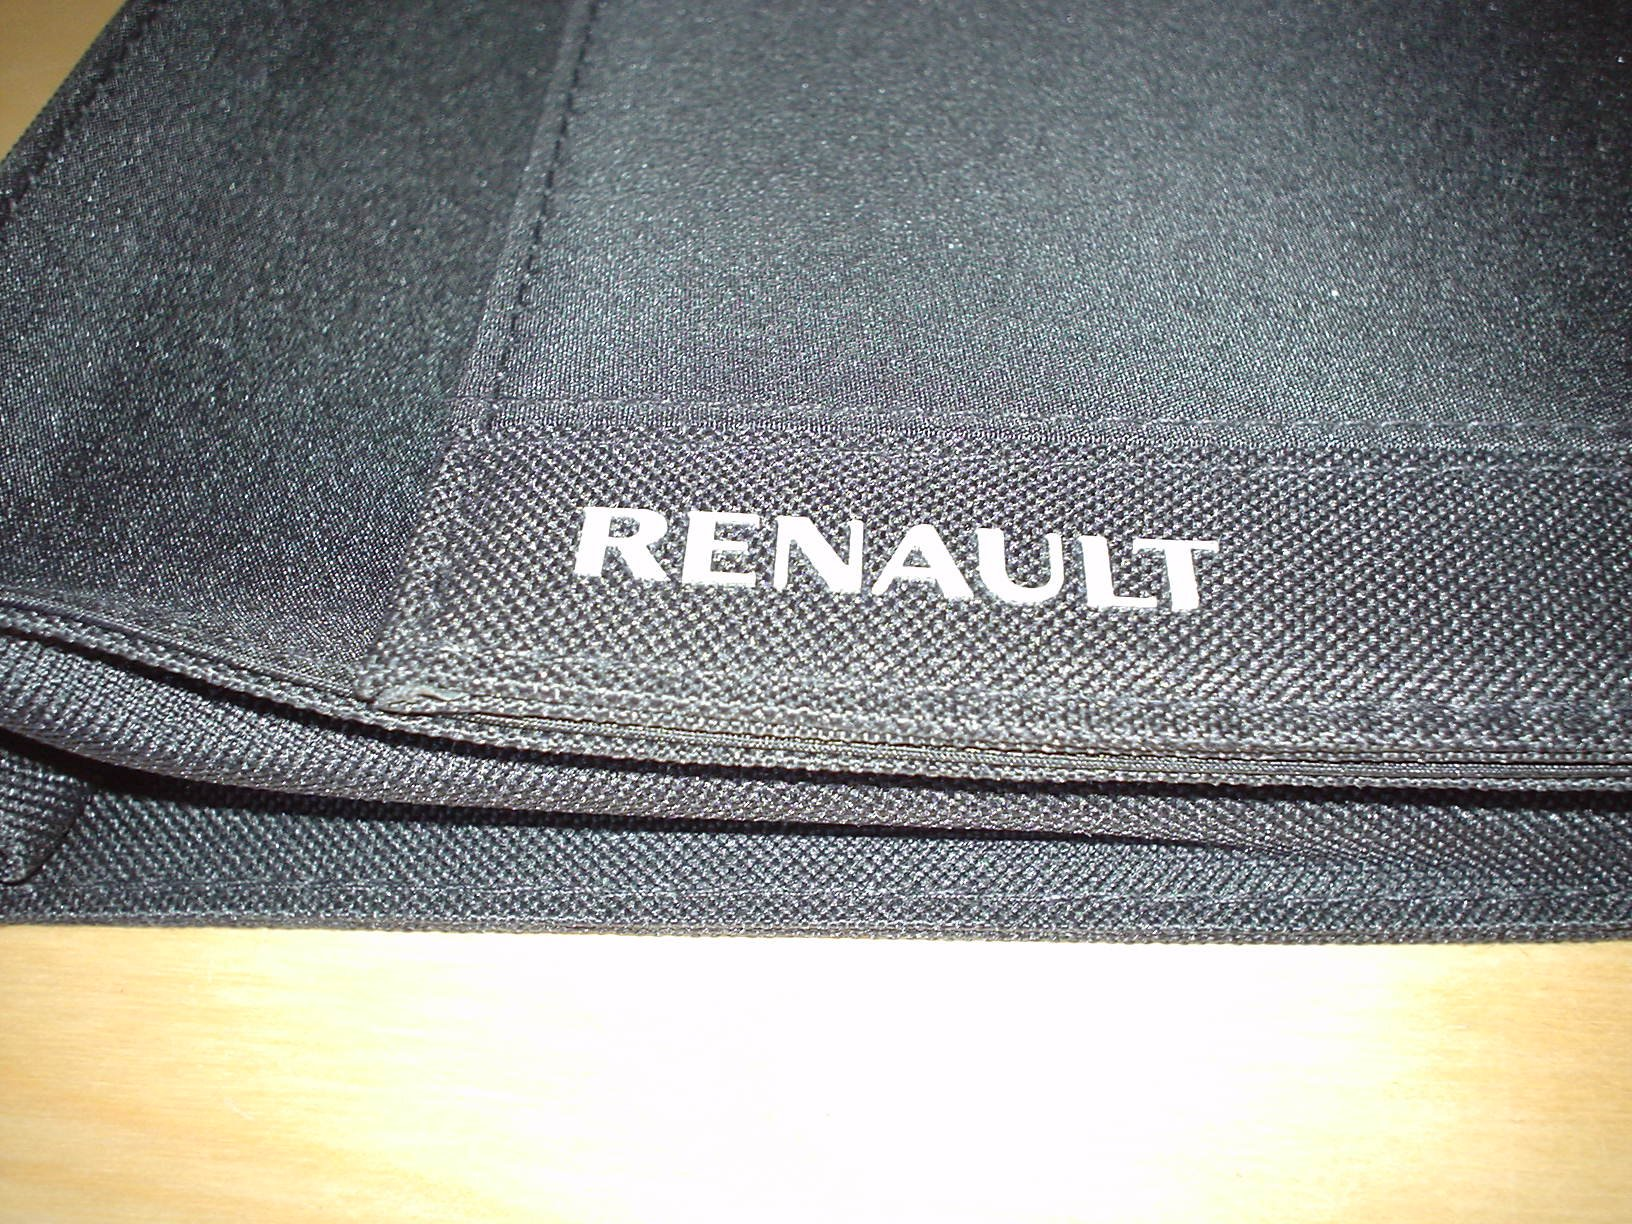 RENAULT SCENIC & GRAND SCENIC III OWNERS MANUAL HANDBOOK c/w WALLET (2009 -  2013) - 1.4 TCE 1.6 2.0 LITRE PETROL 1.5 1.9 2.0 dCI TURBO DIESEL ENGINE ...